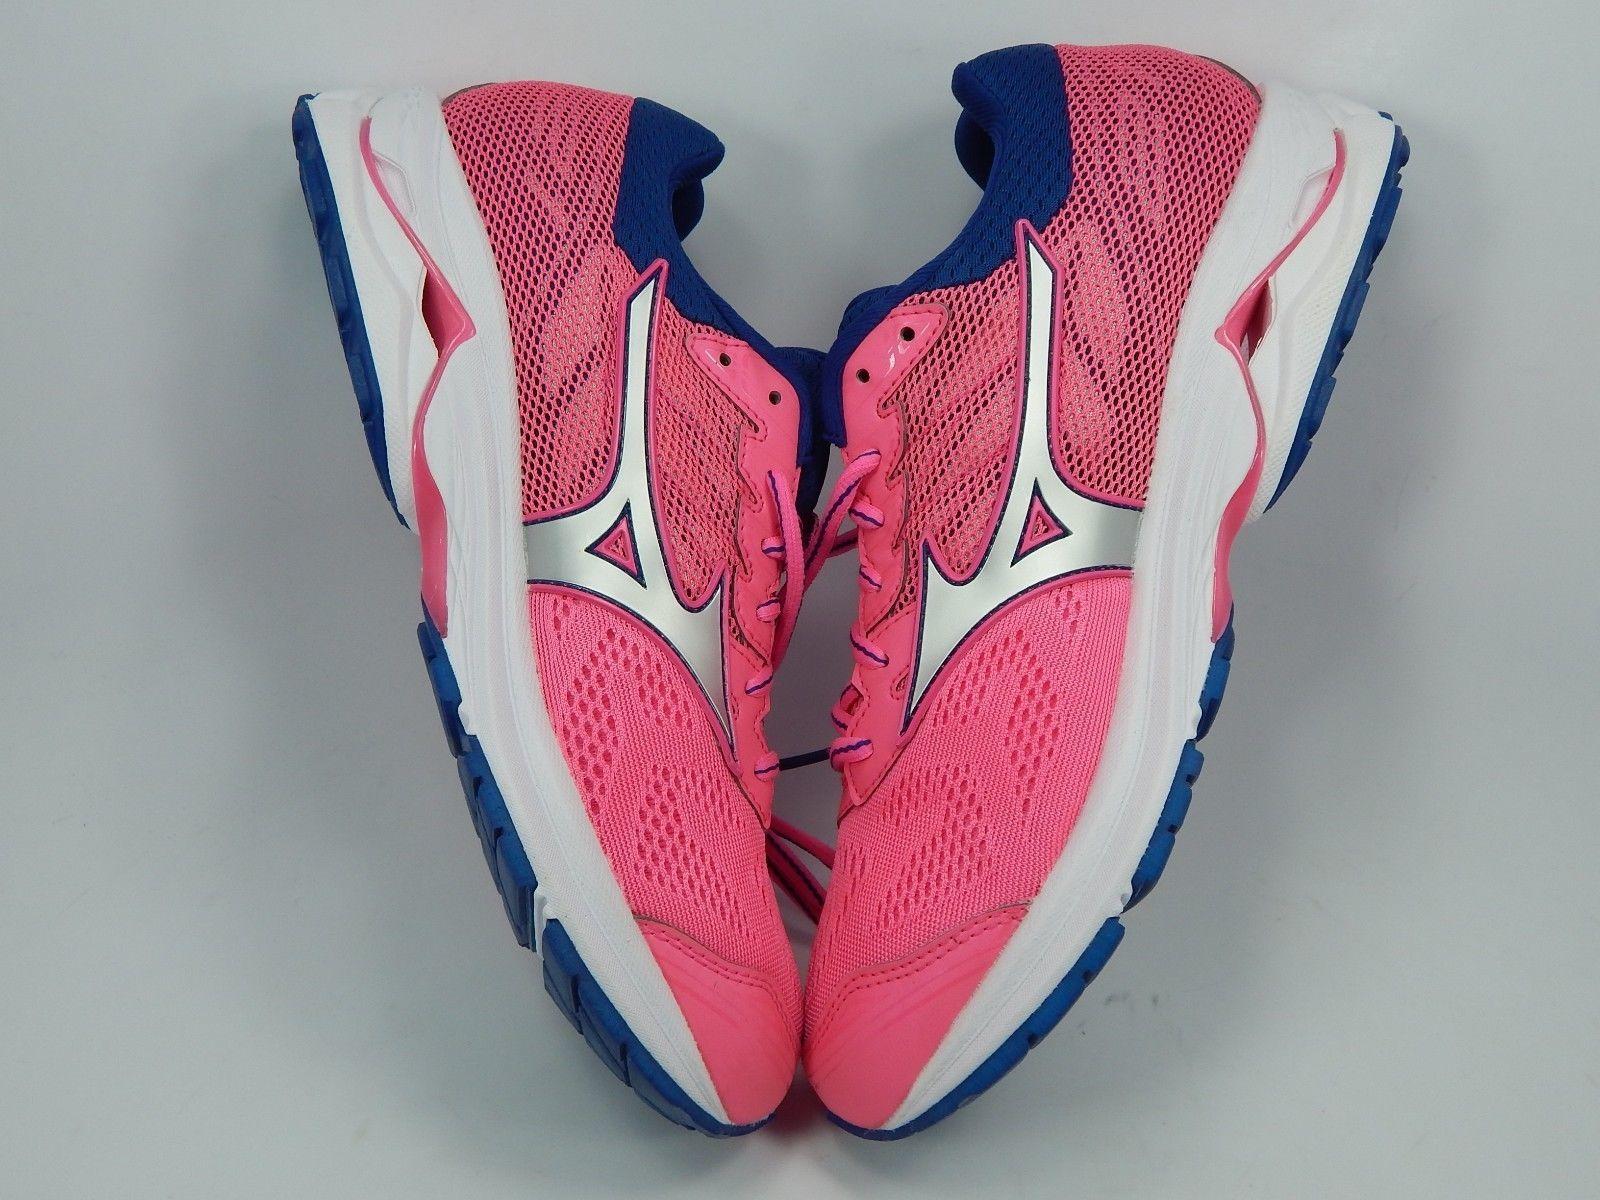 MISMATCH Mizuno Wave Rider 21 Size 8.5 M Left & 9.5 M Right Women's Shoes